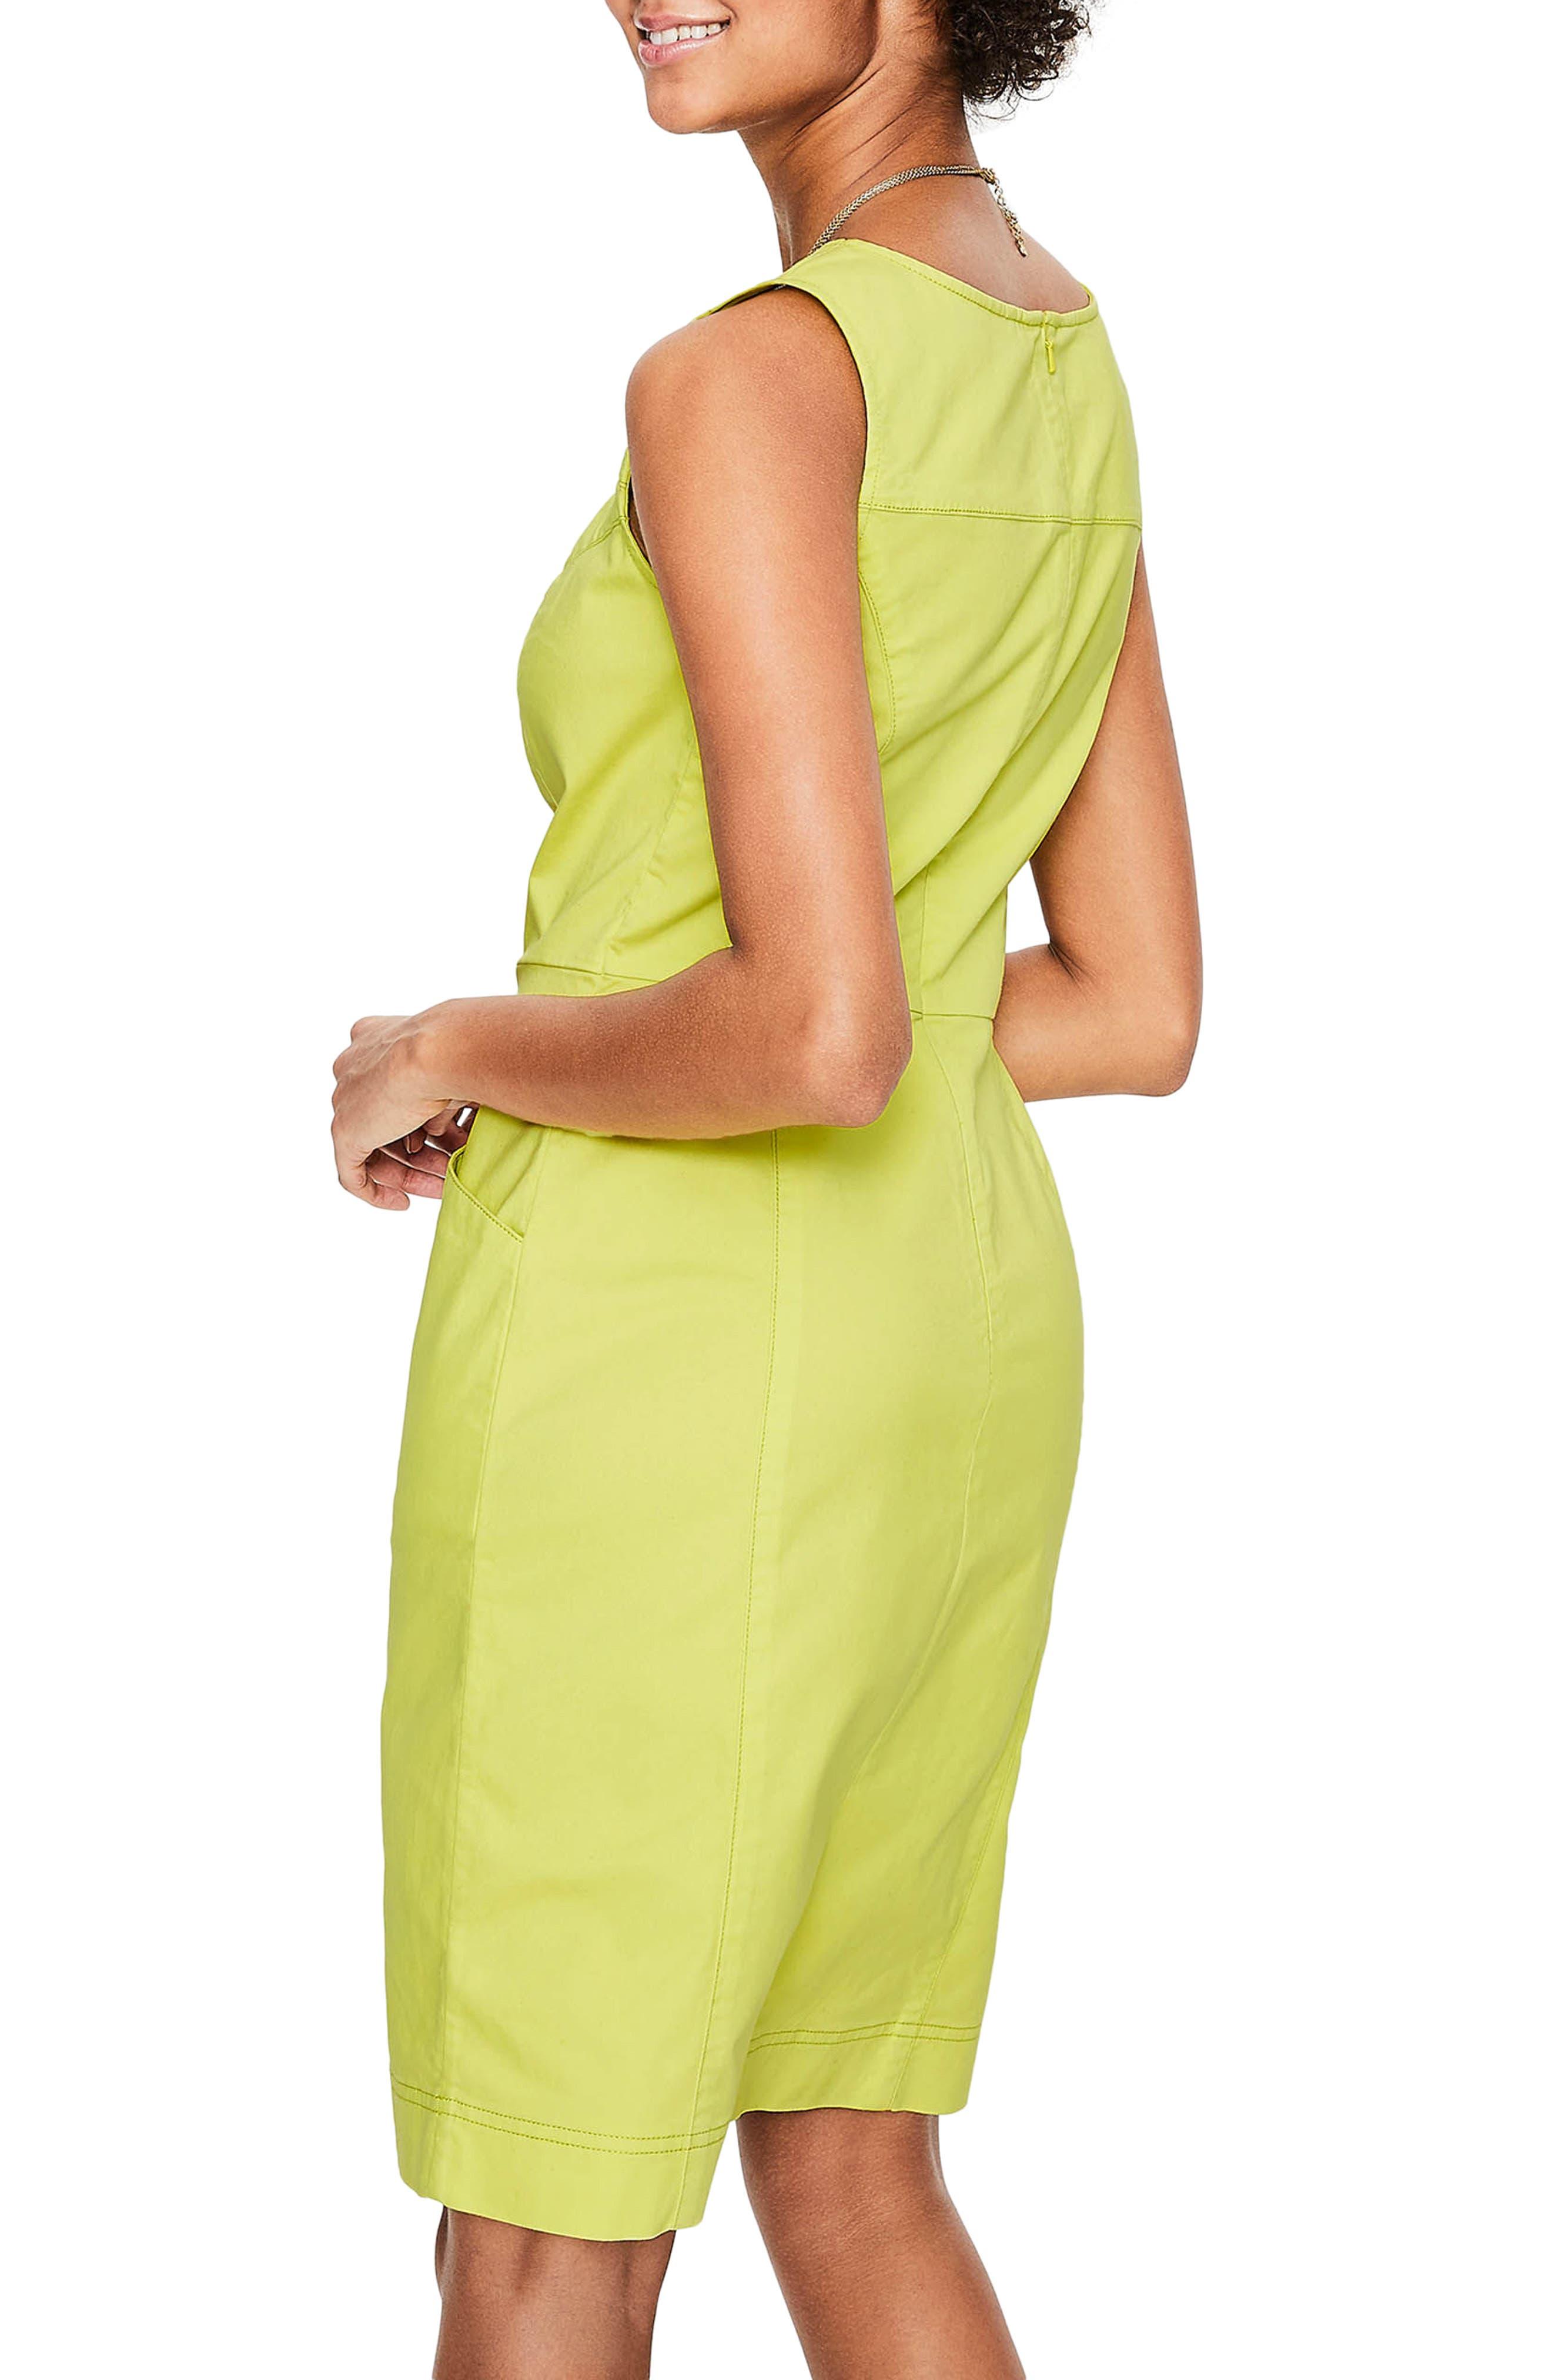 Tamara Stretch Cotton Sleeveless Dress,                             Alternate thumbnail 3, color,                             Citrus